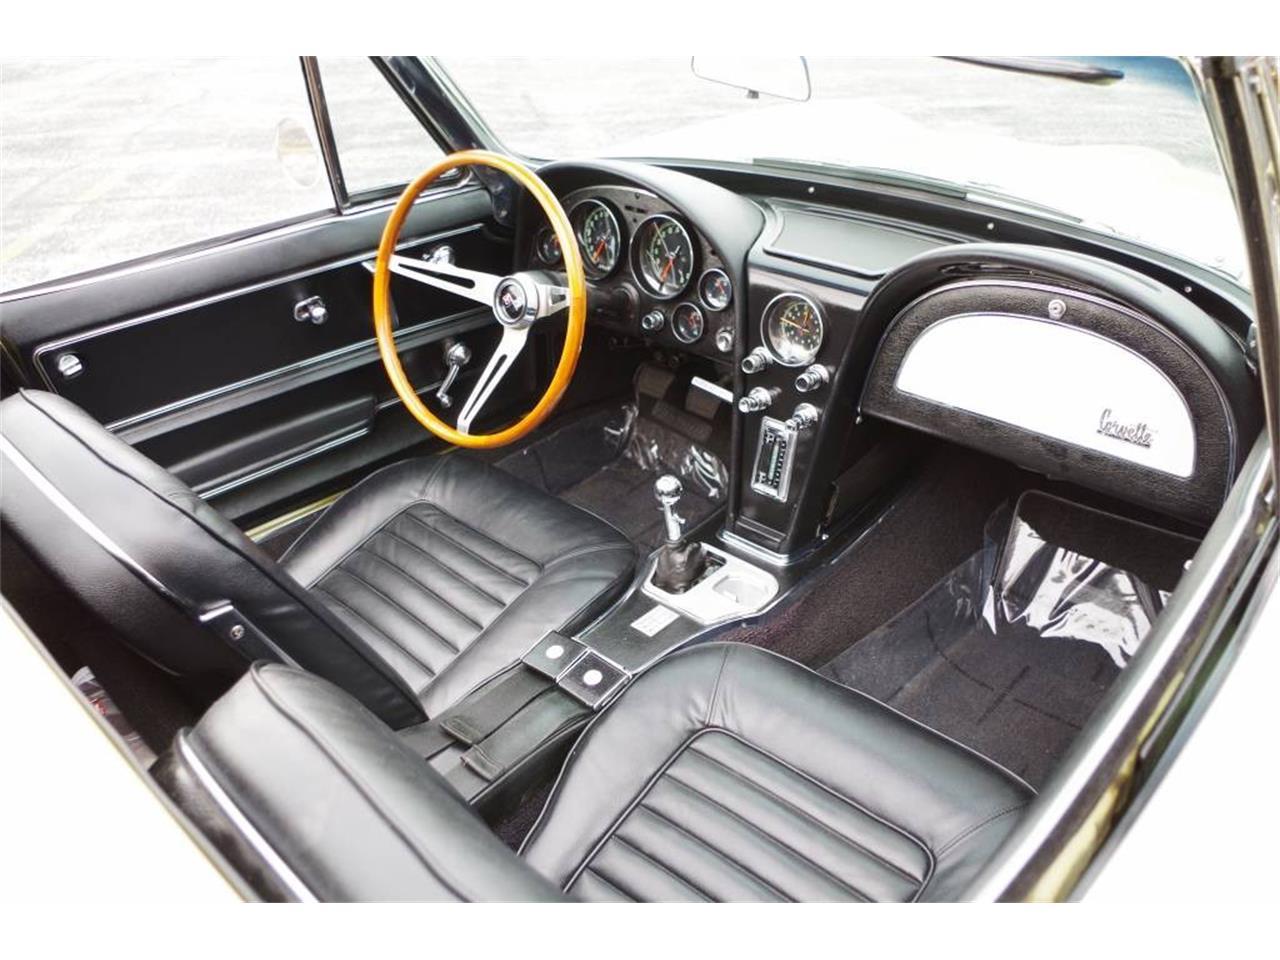 Large Picture of Classic '66 Corvette located in Missouri - MO1Z